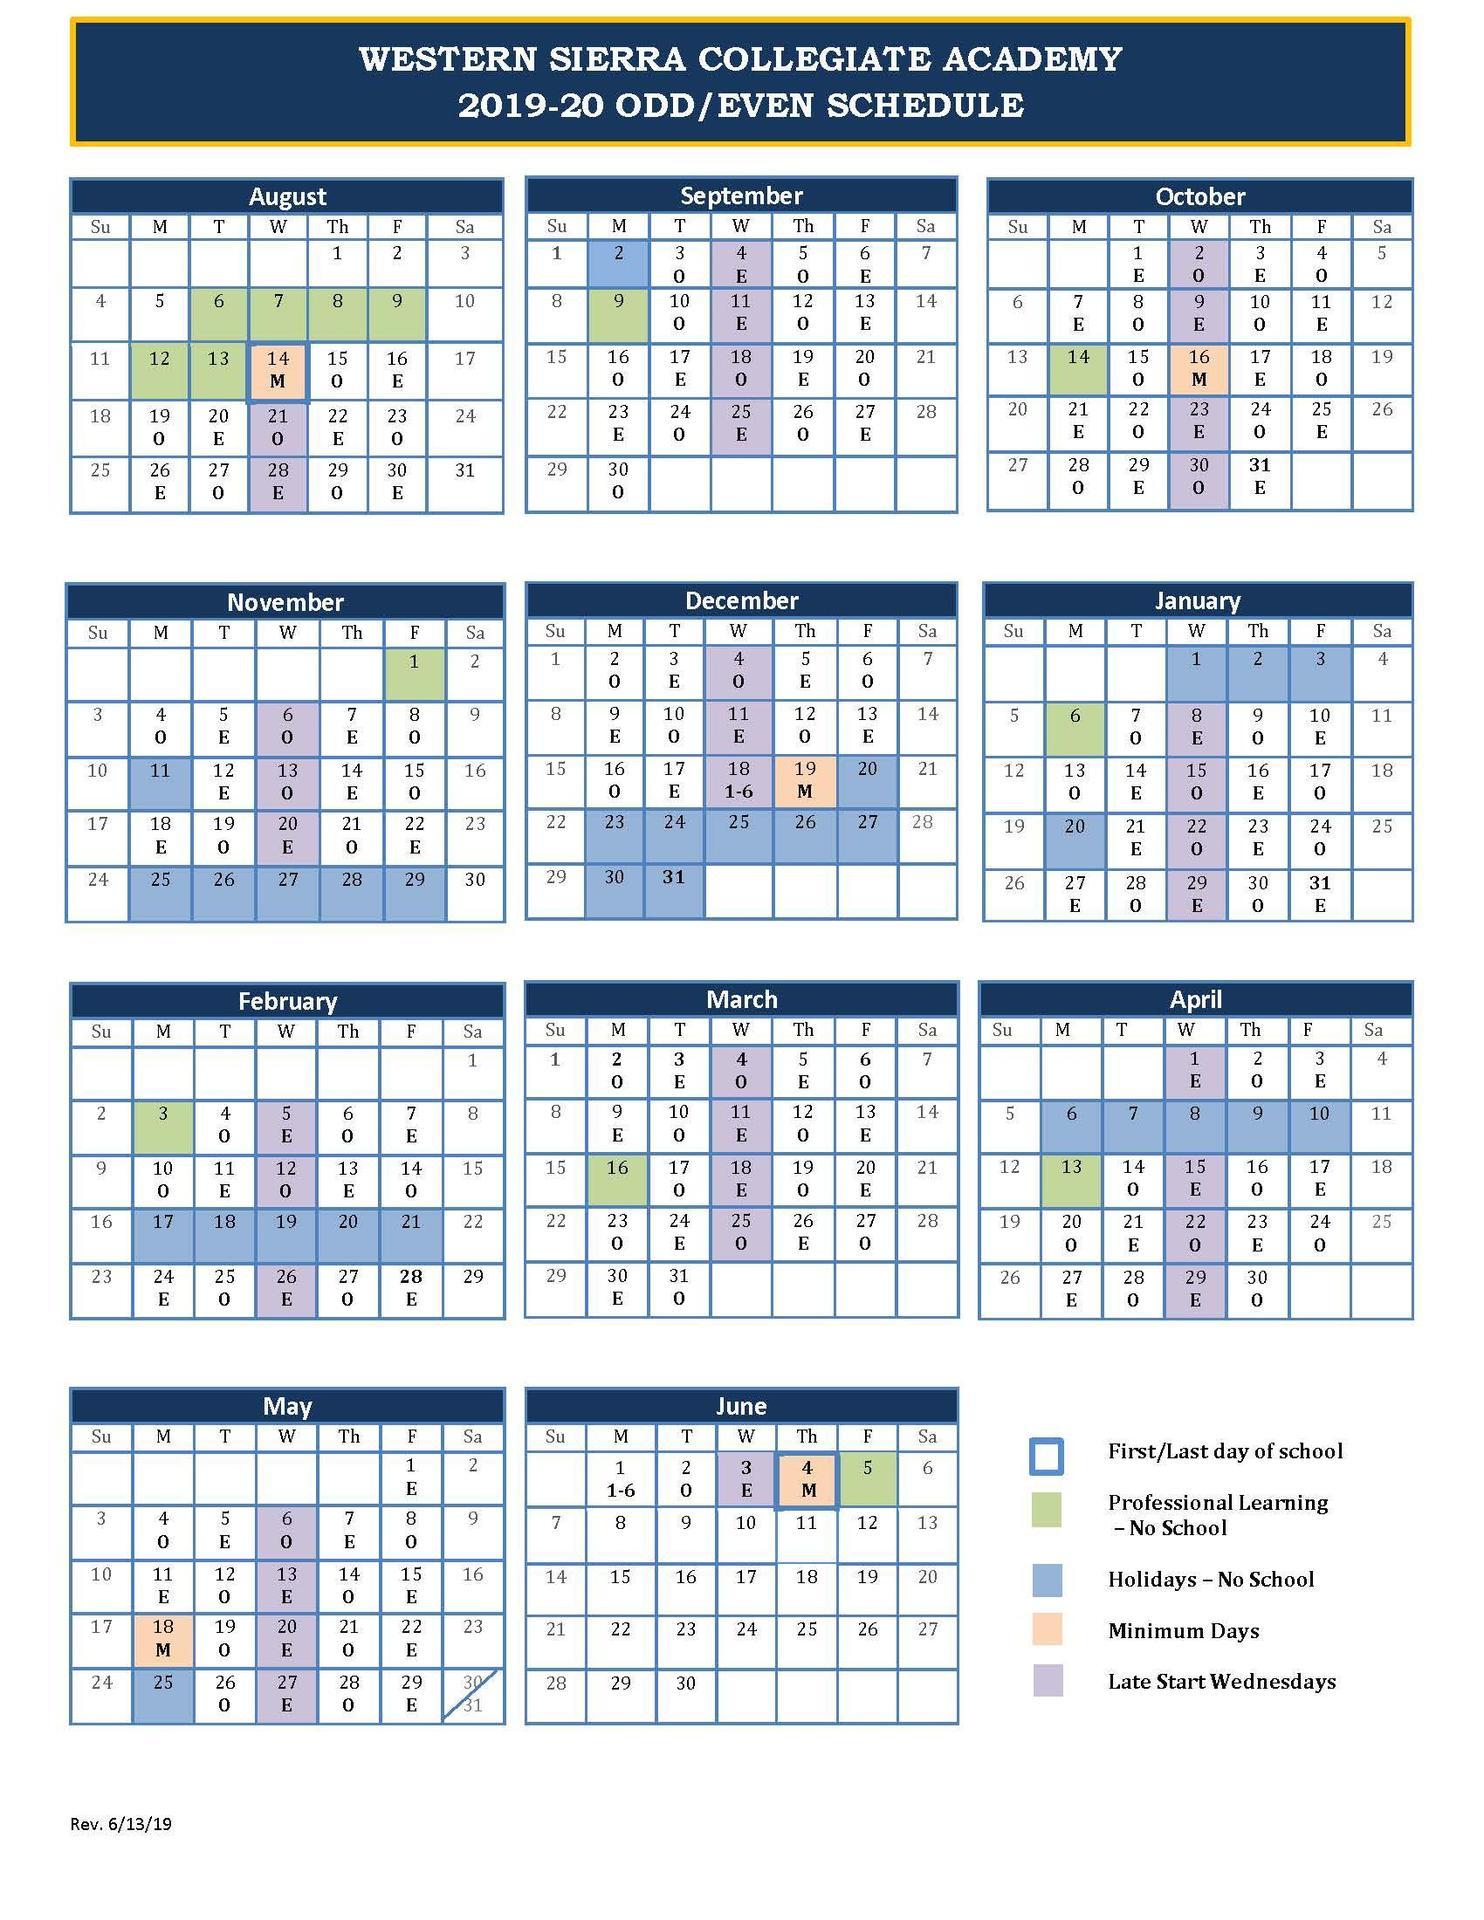 Odd/Even Schedule